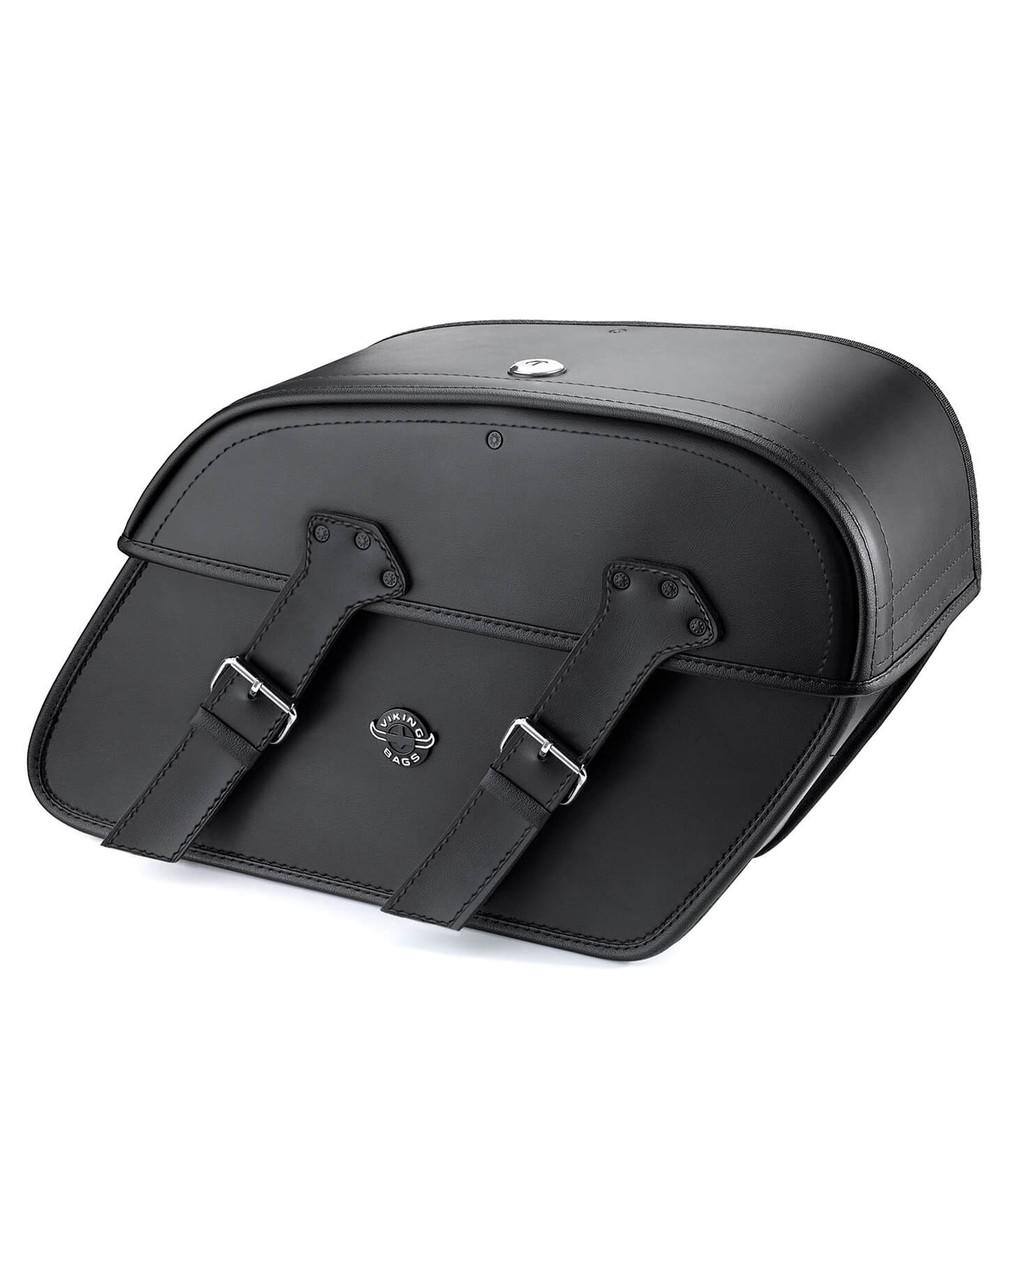 Honda VTX 1300 C Viking Raven Large Leather Motorcycle Saddlebags Main Bag View